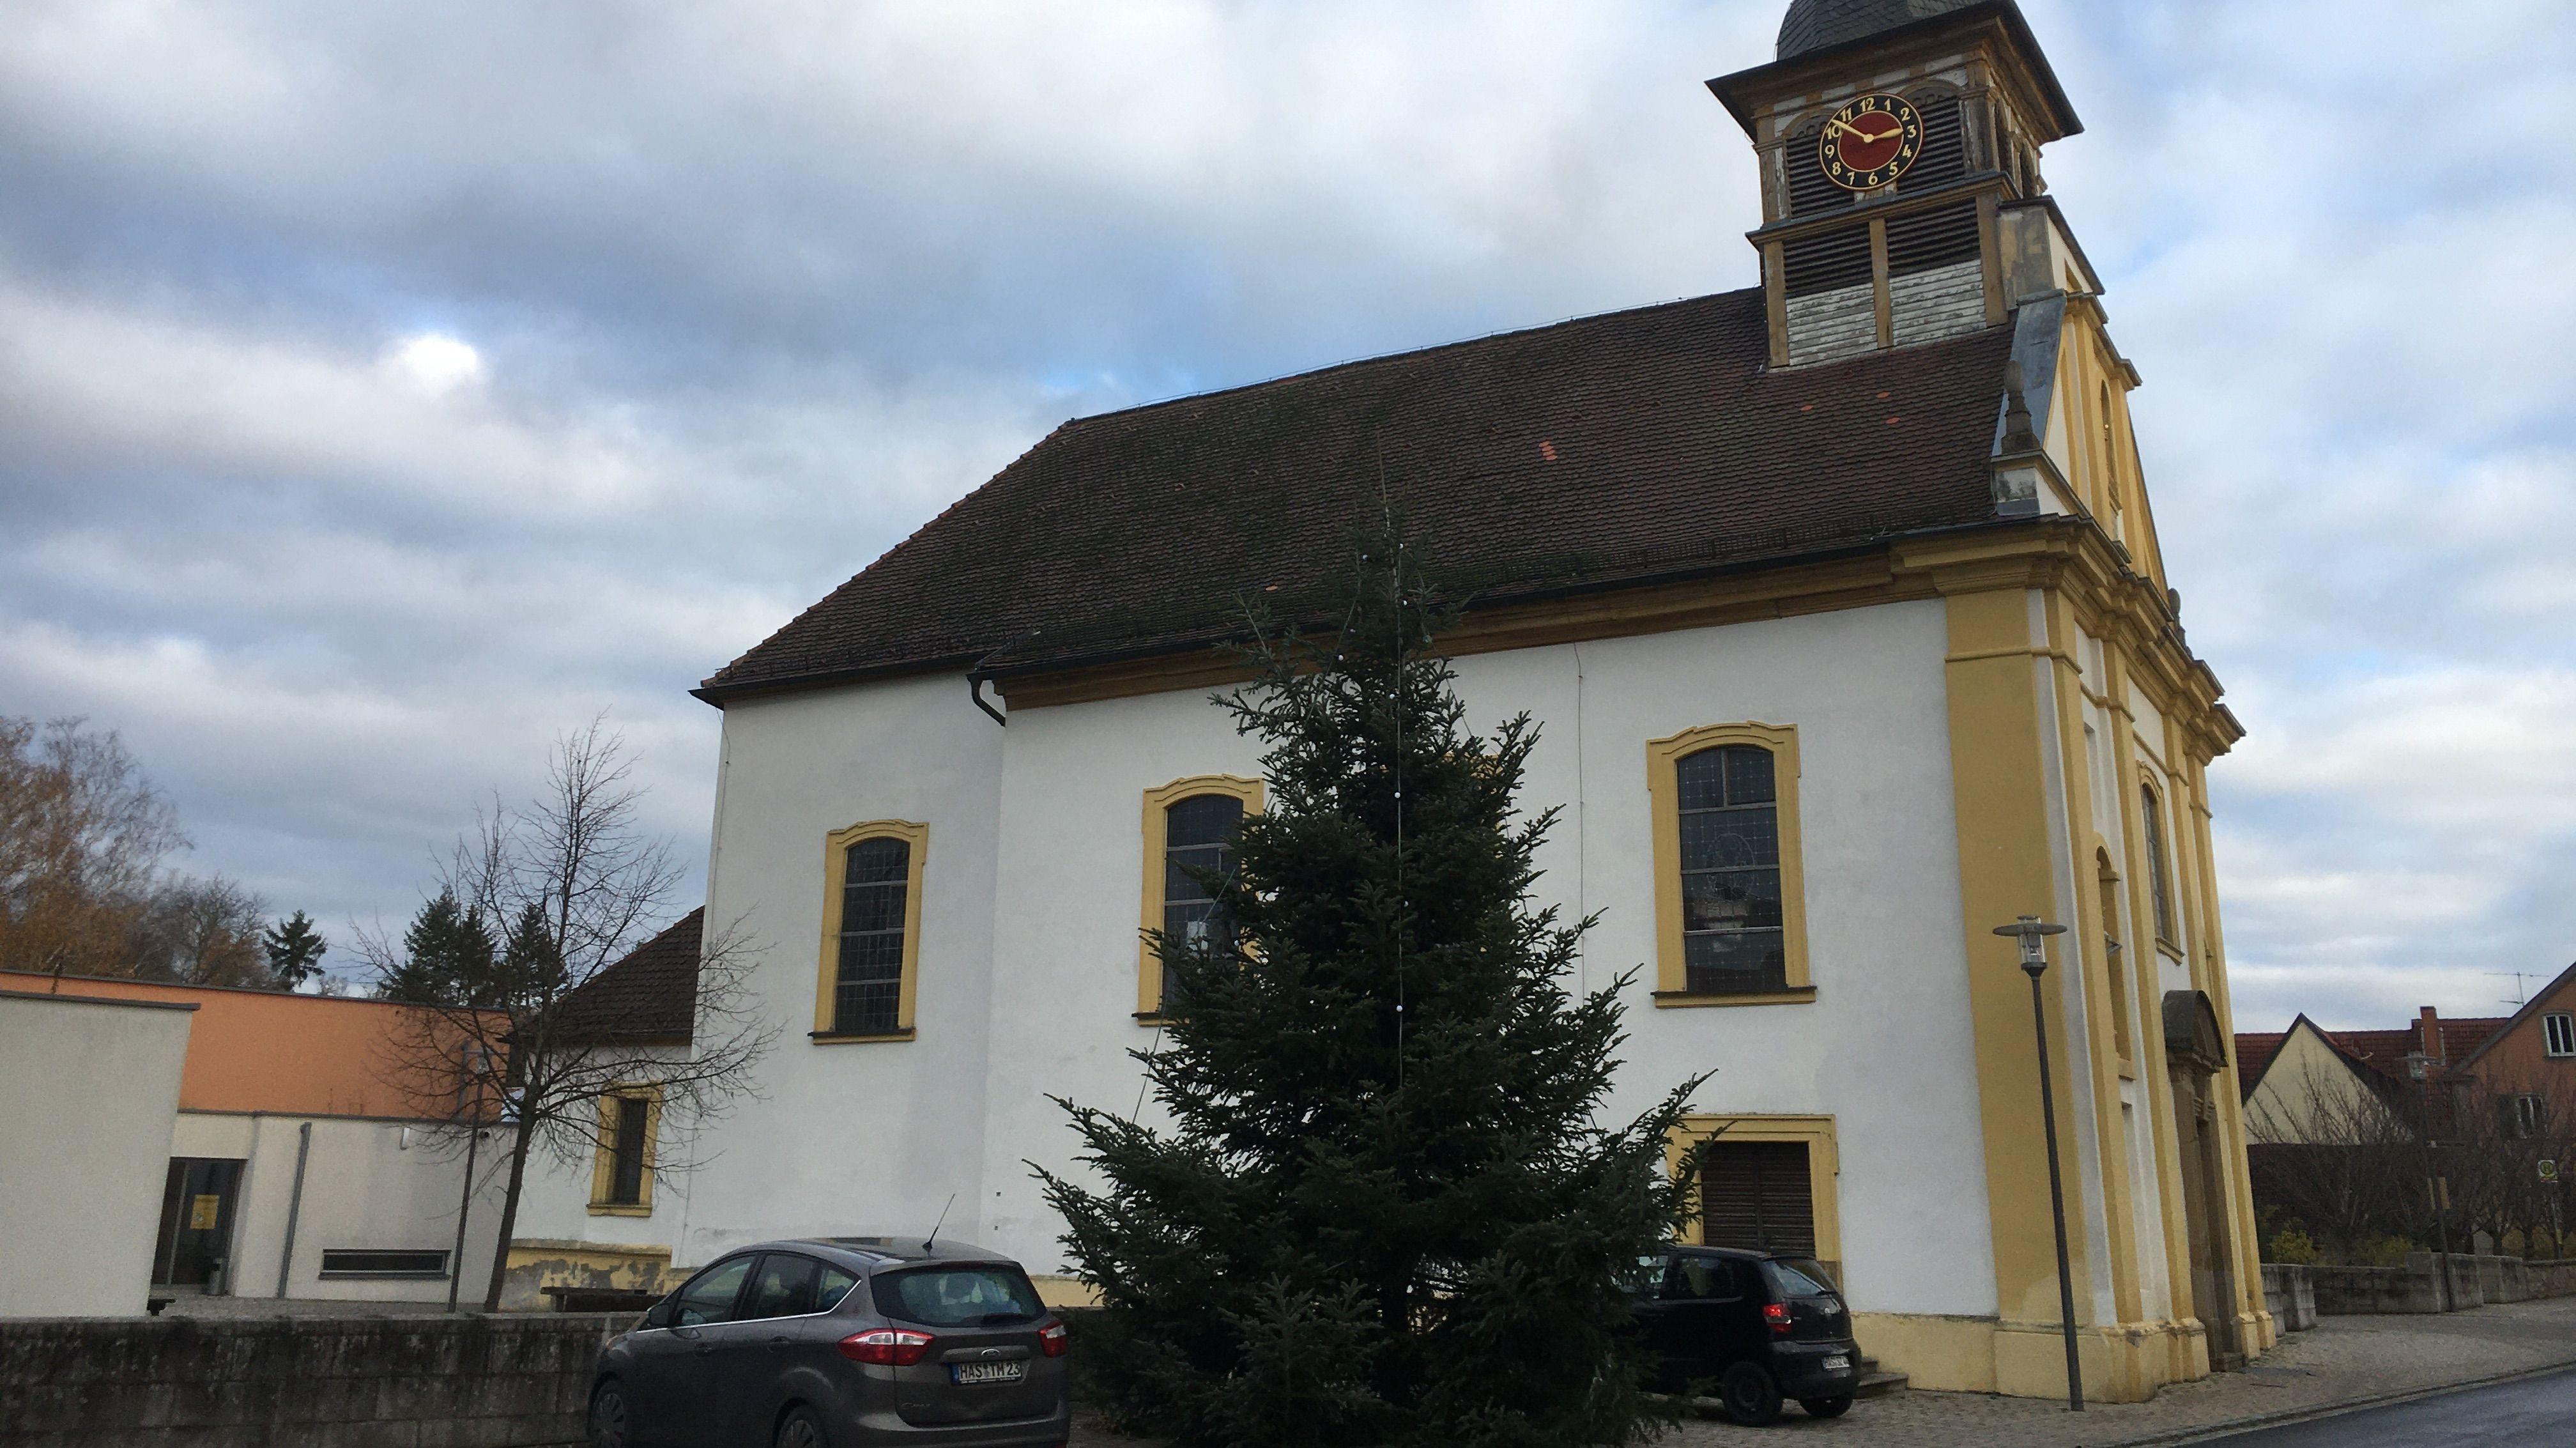 St. Barbara in Oberschwappach